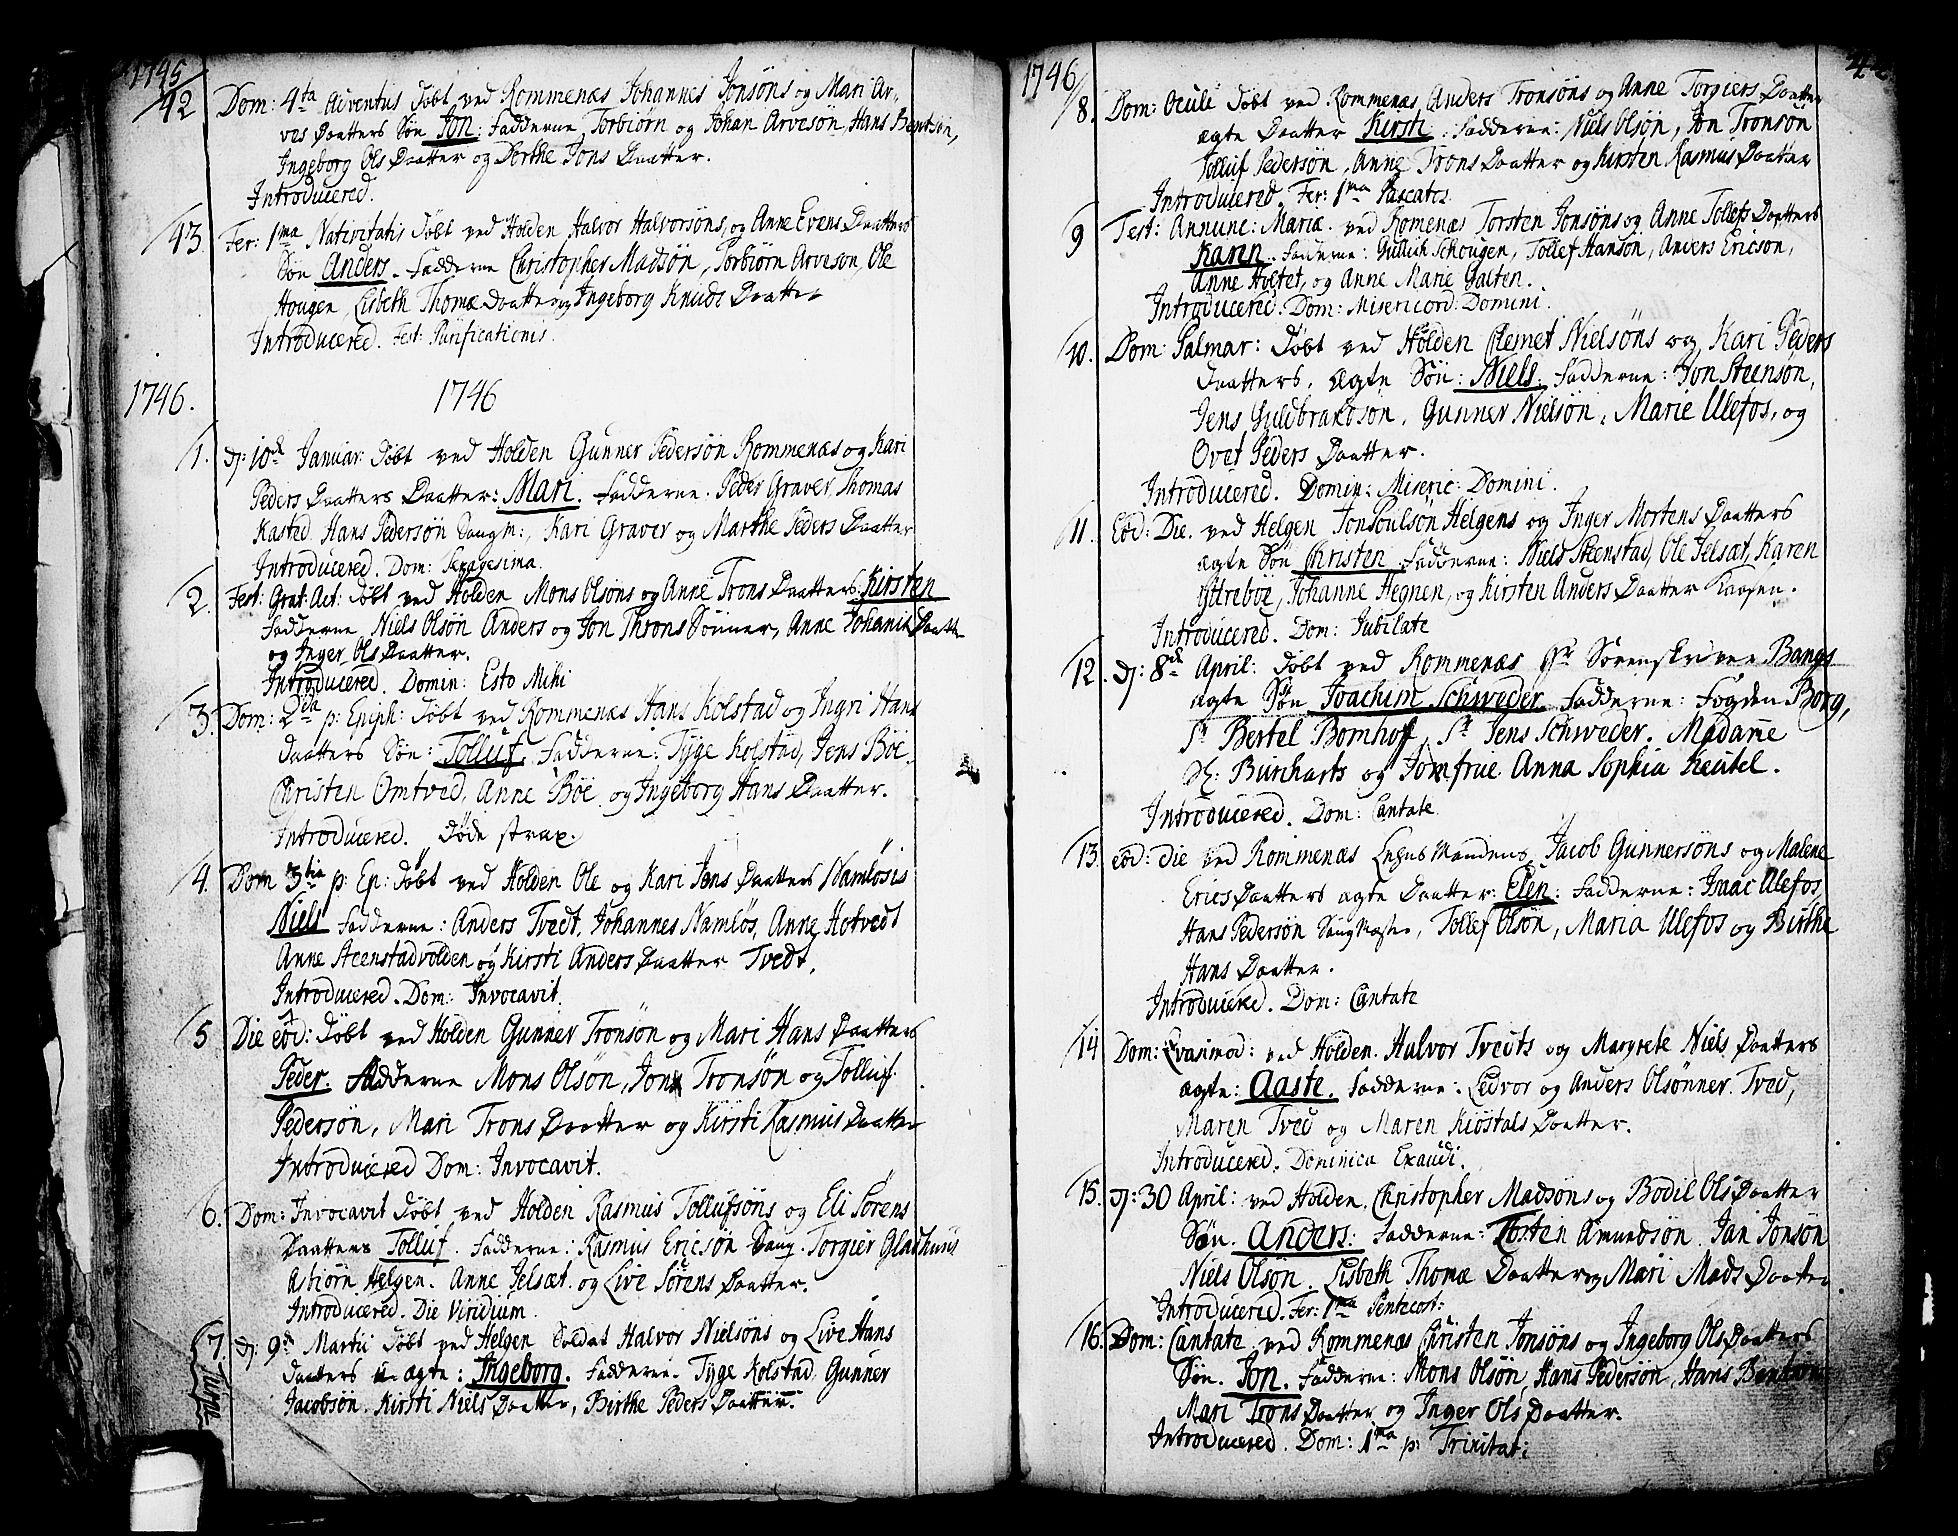 SAKO, Holla kirkebøker, F/Fa/L0001: Ministerialbok nr. 1, 1717-1779, s. 44